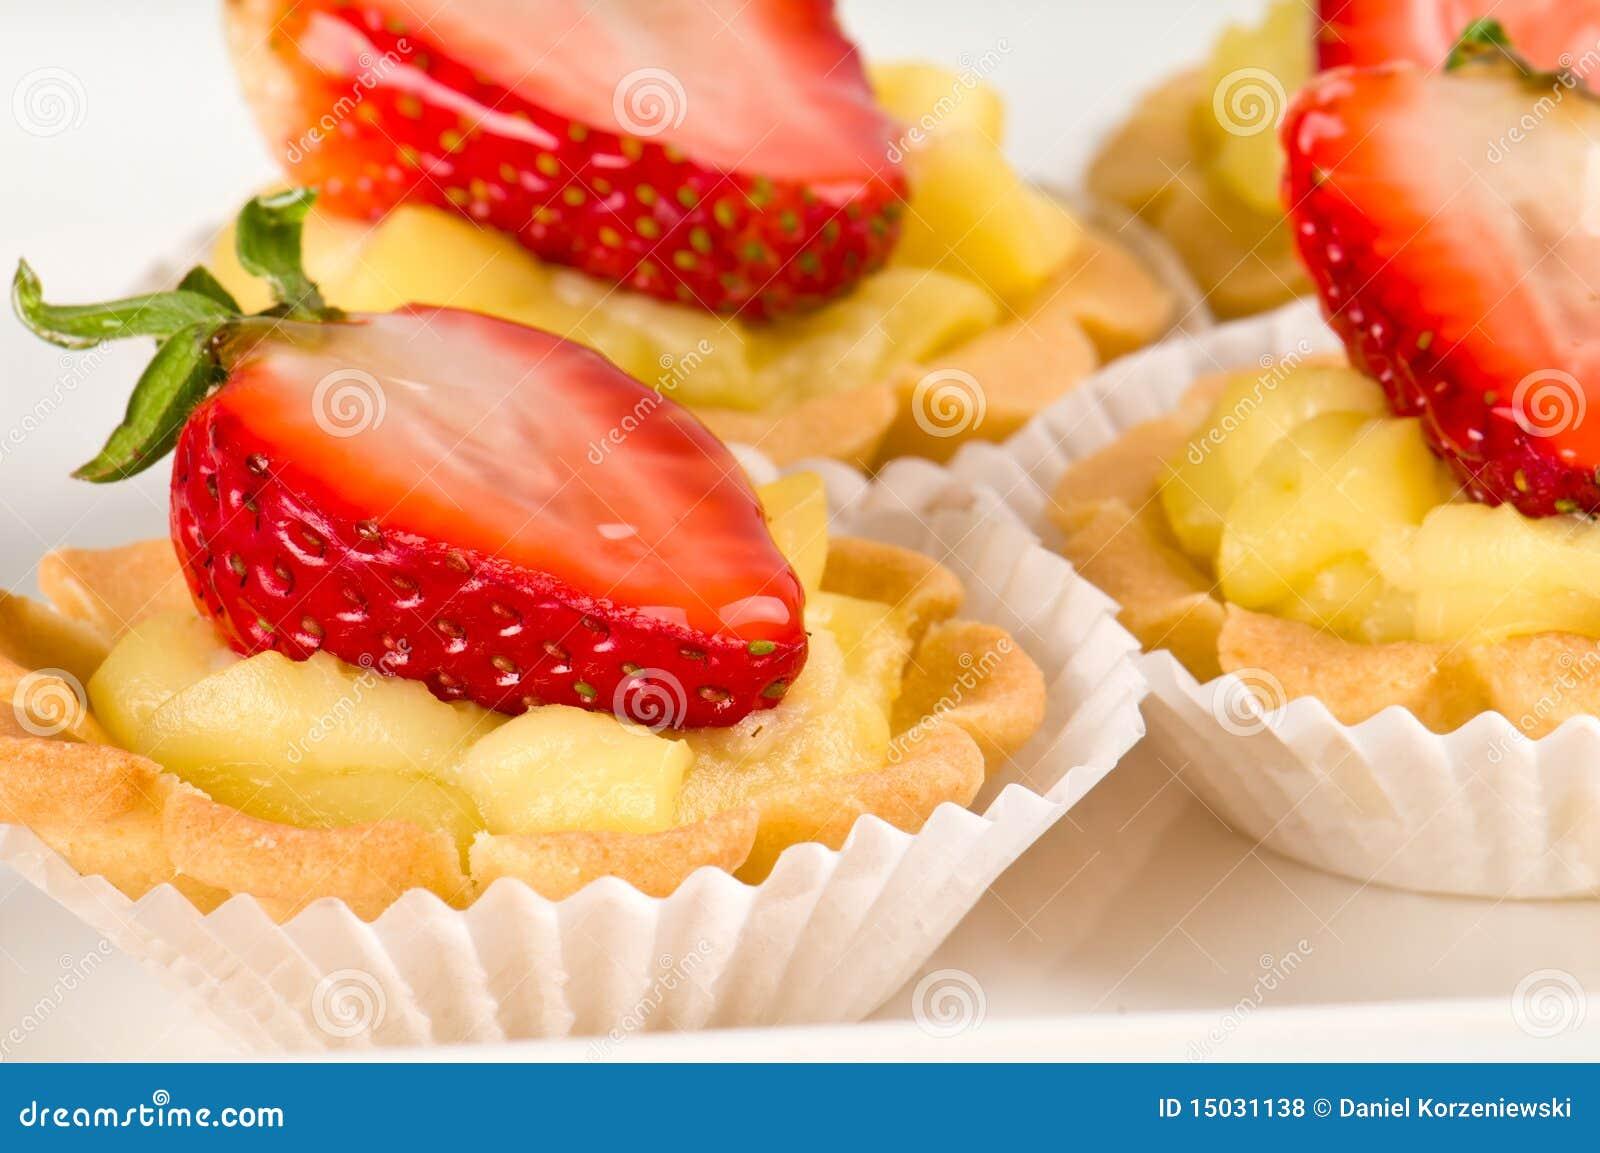 Strawberry dessert with cream fill